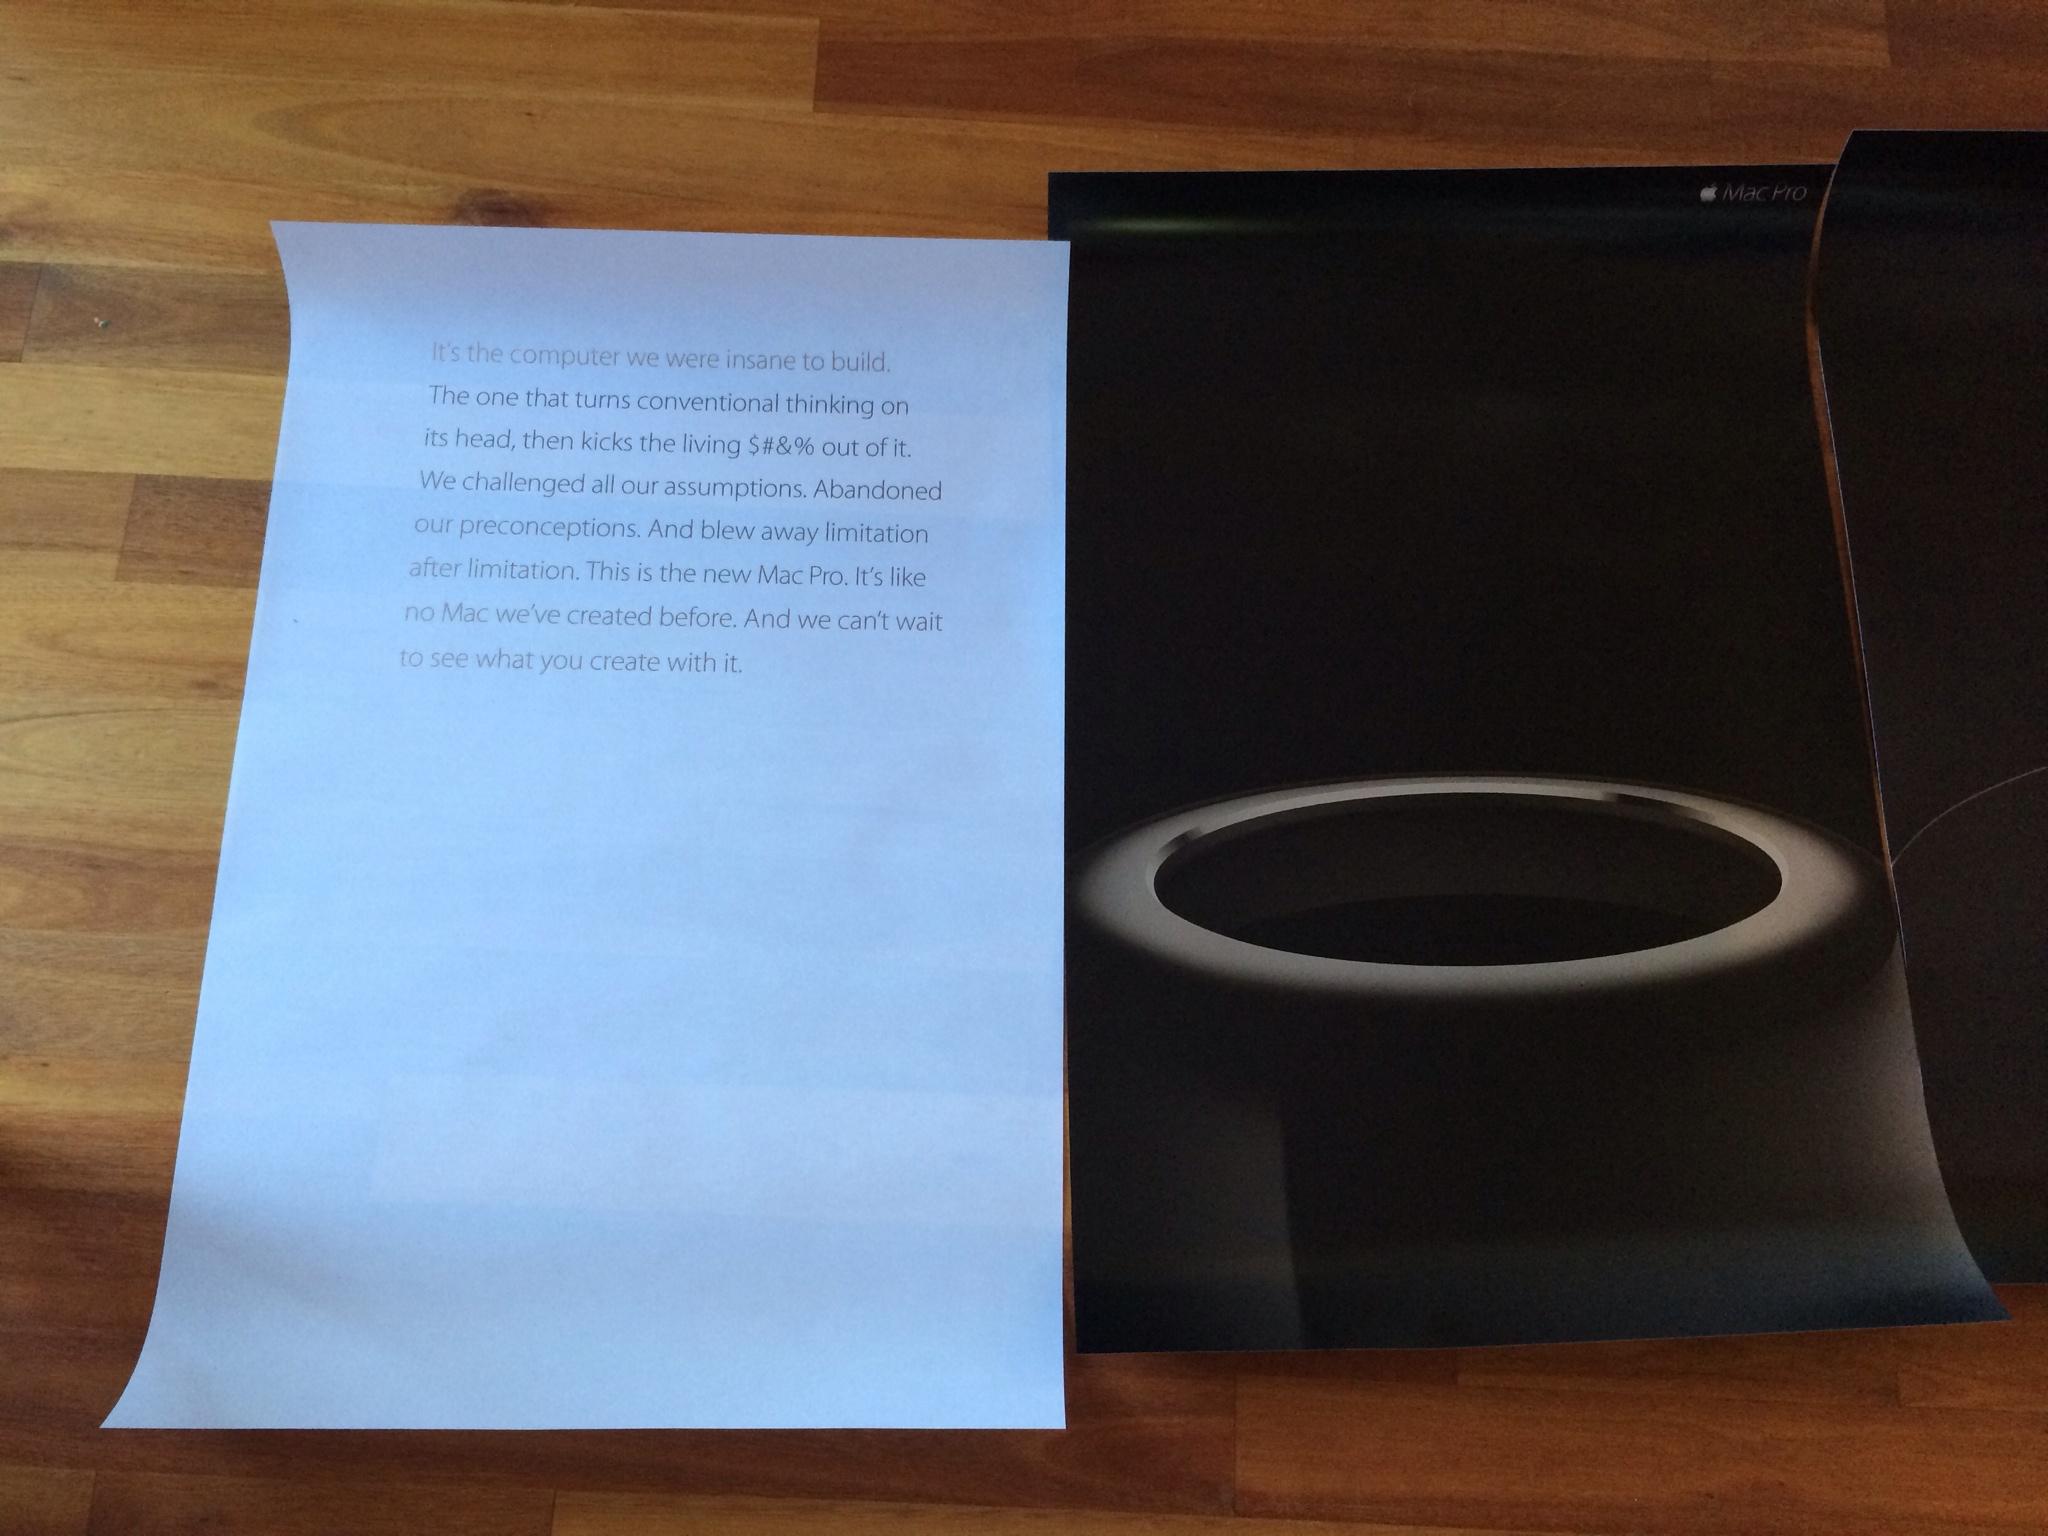 Mac Pro (poster 001)